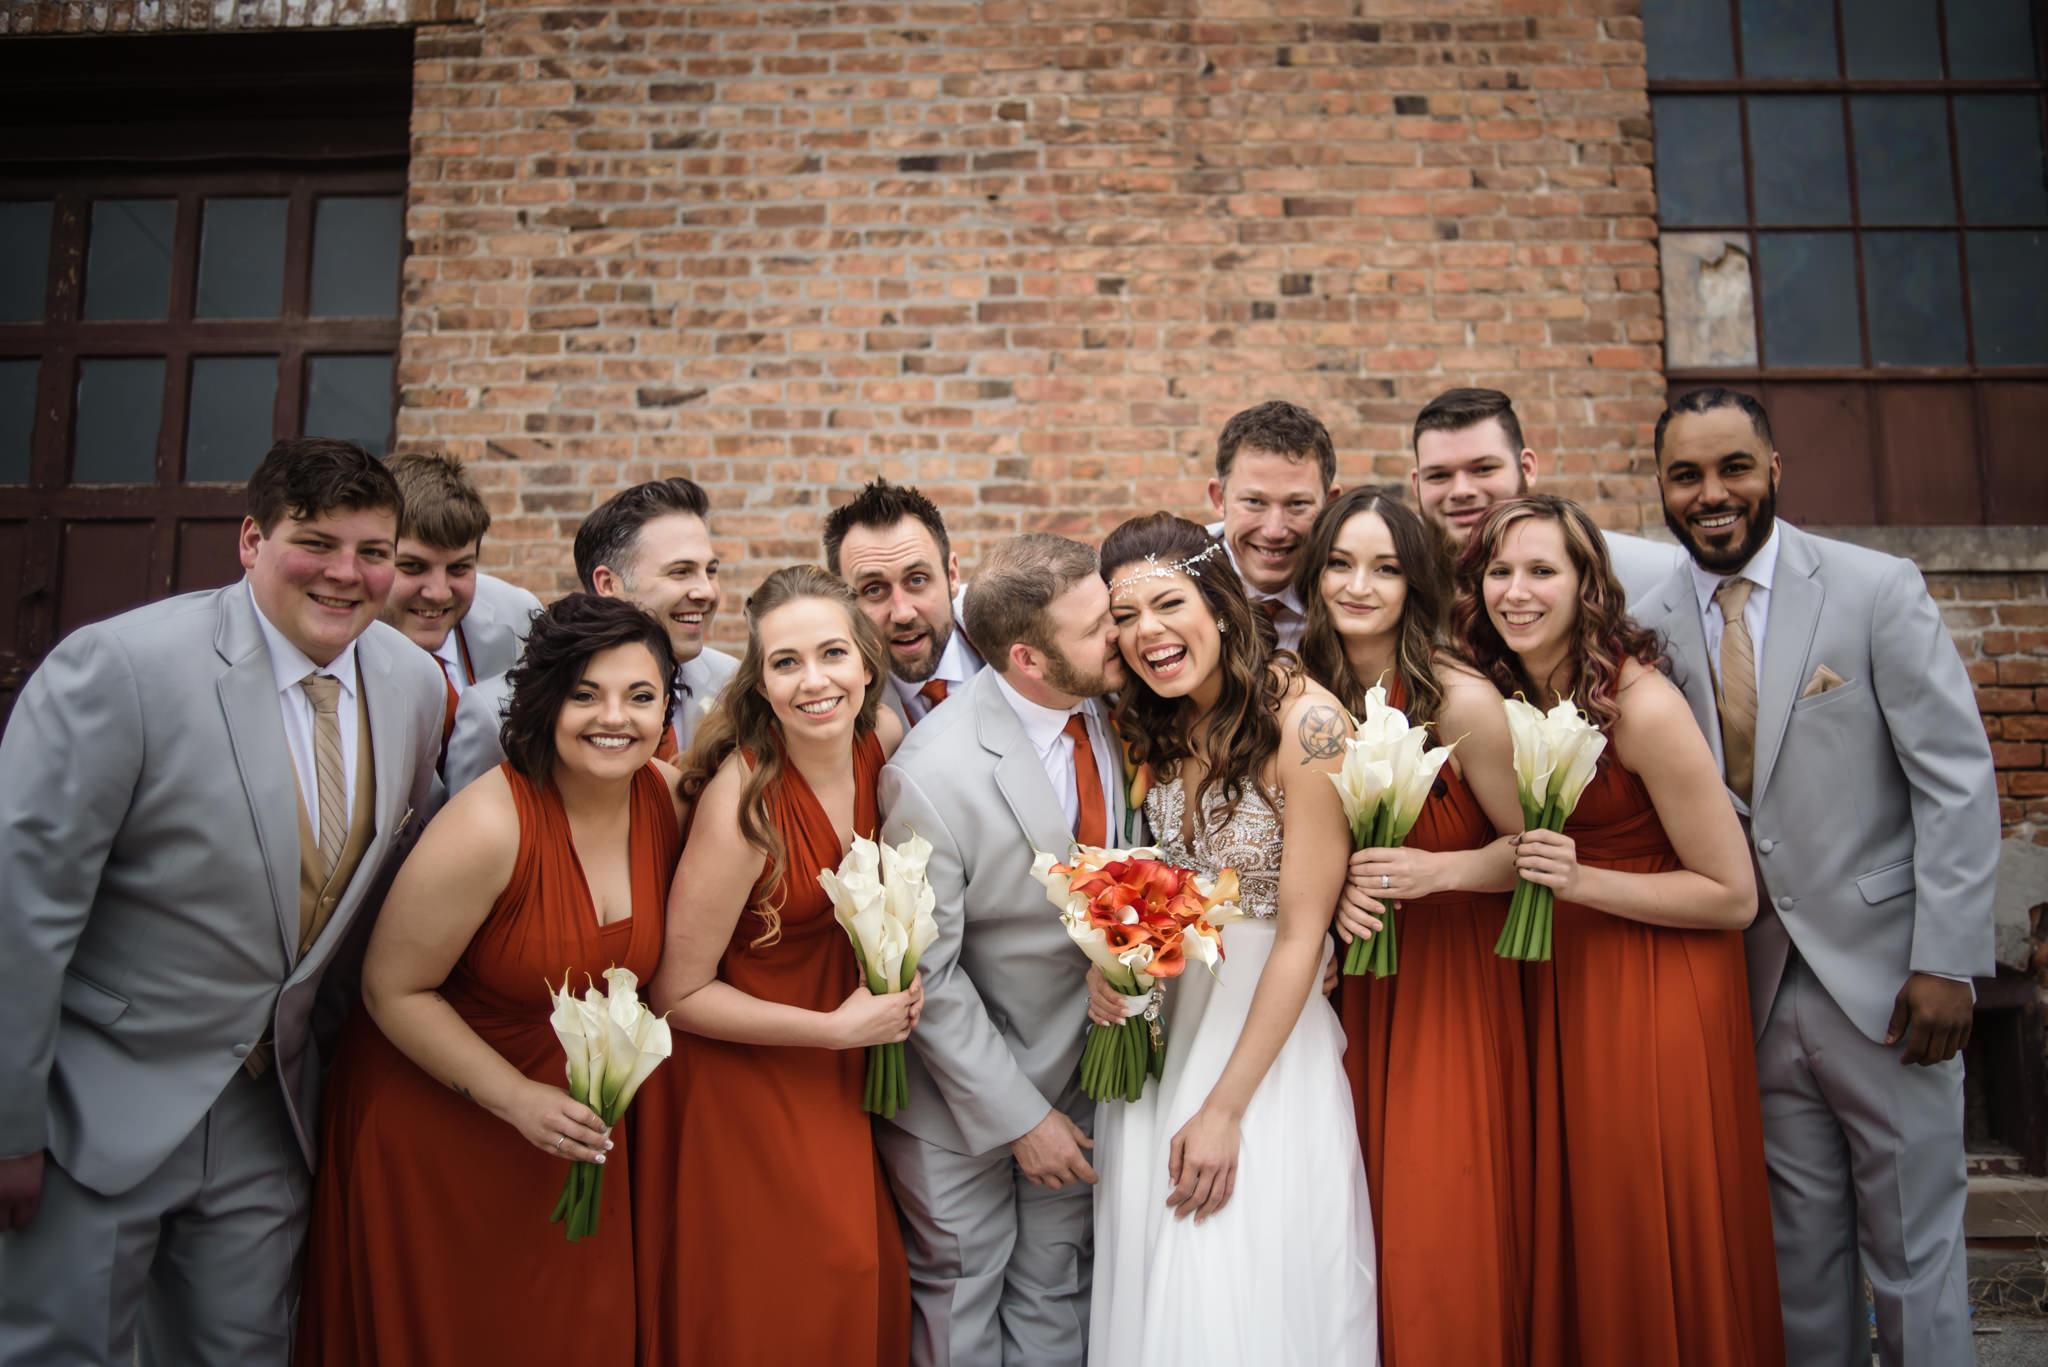 HILTON-OMAHA-WEDDING-PHOTOGRAPHER-JM-STUDIOS-OMAHA-LIV-BRICE-012.jpg